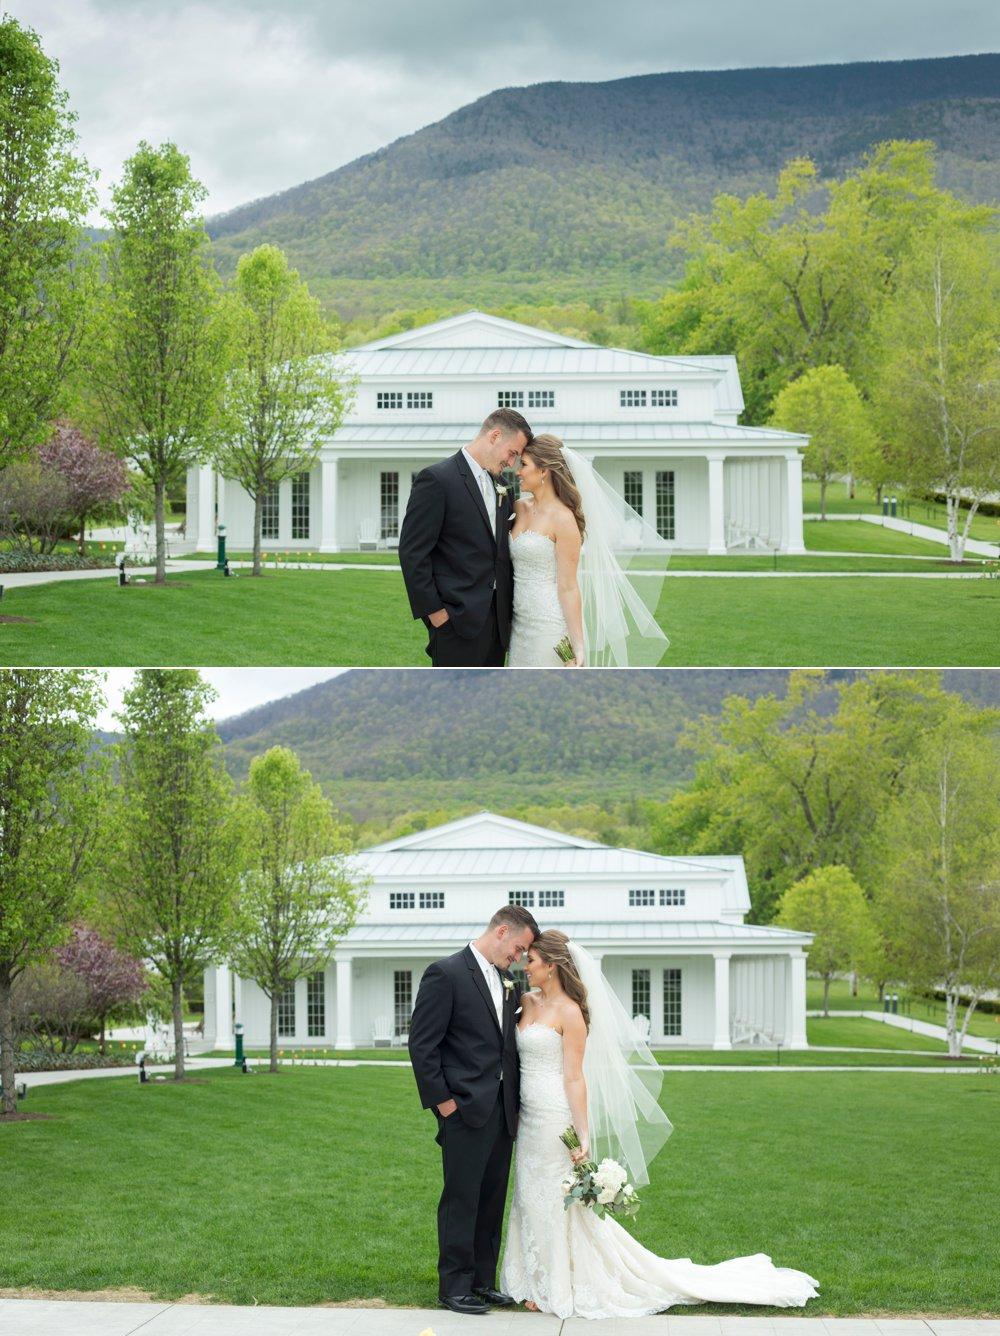 SomerbyJonesPhotography_EquinoxVermont_Wedding_0033.jpg